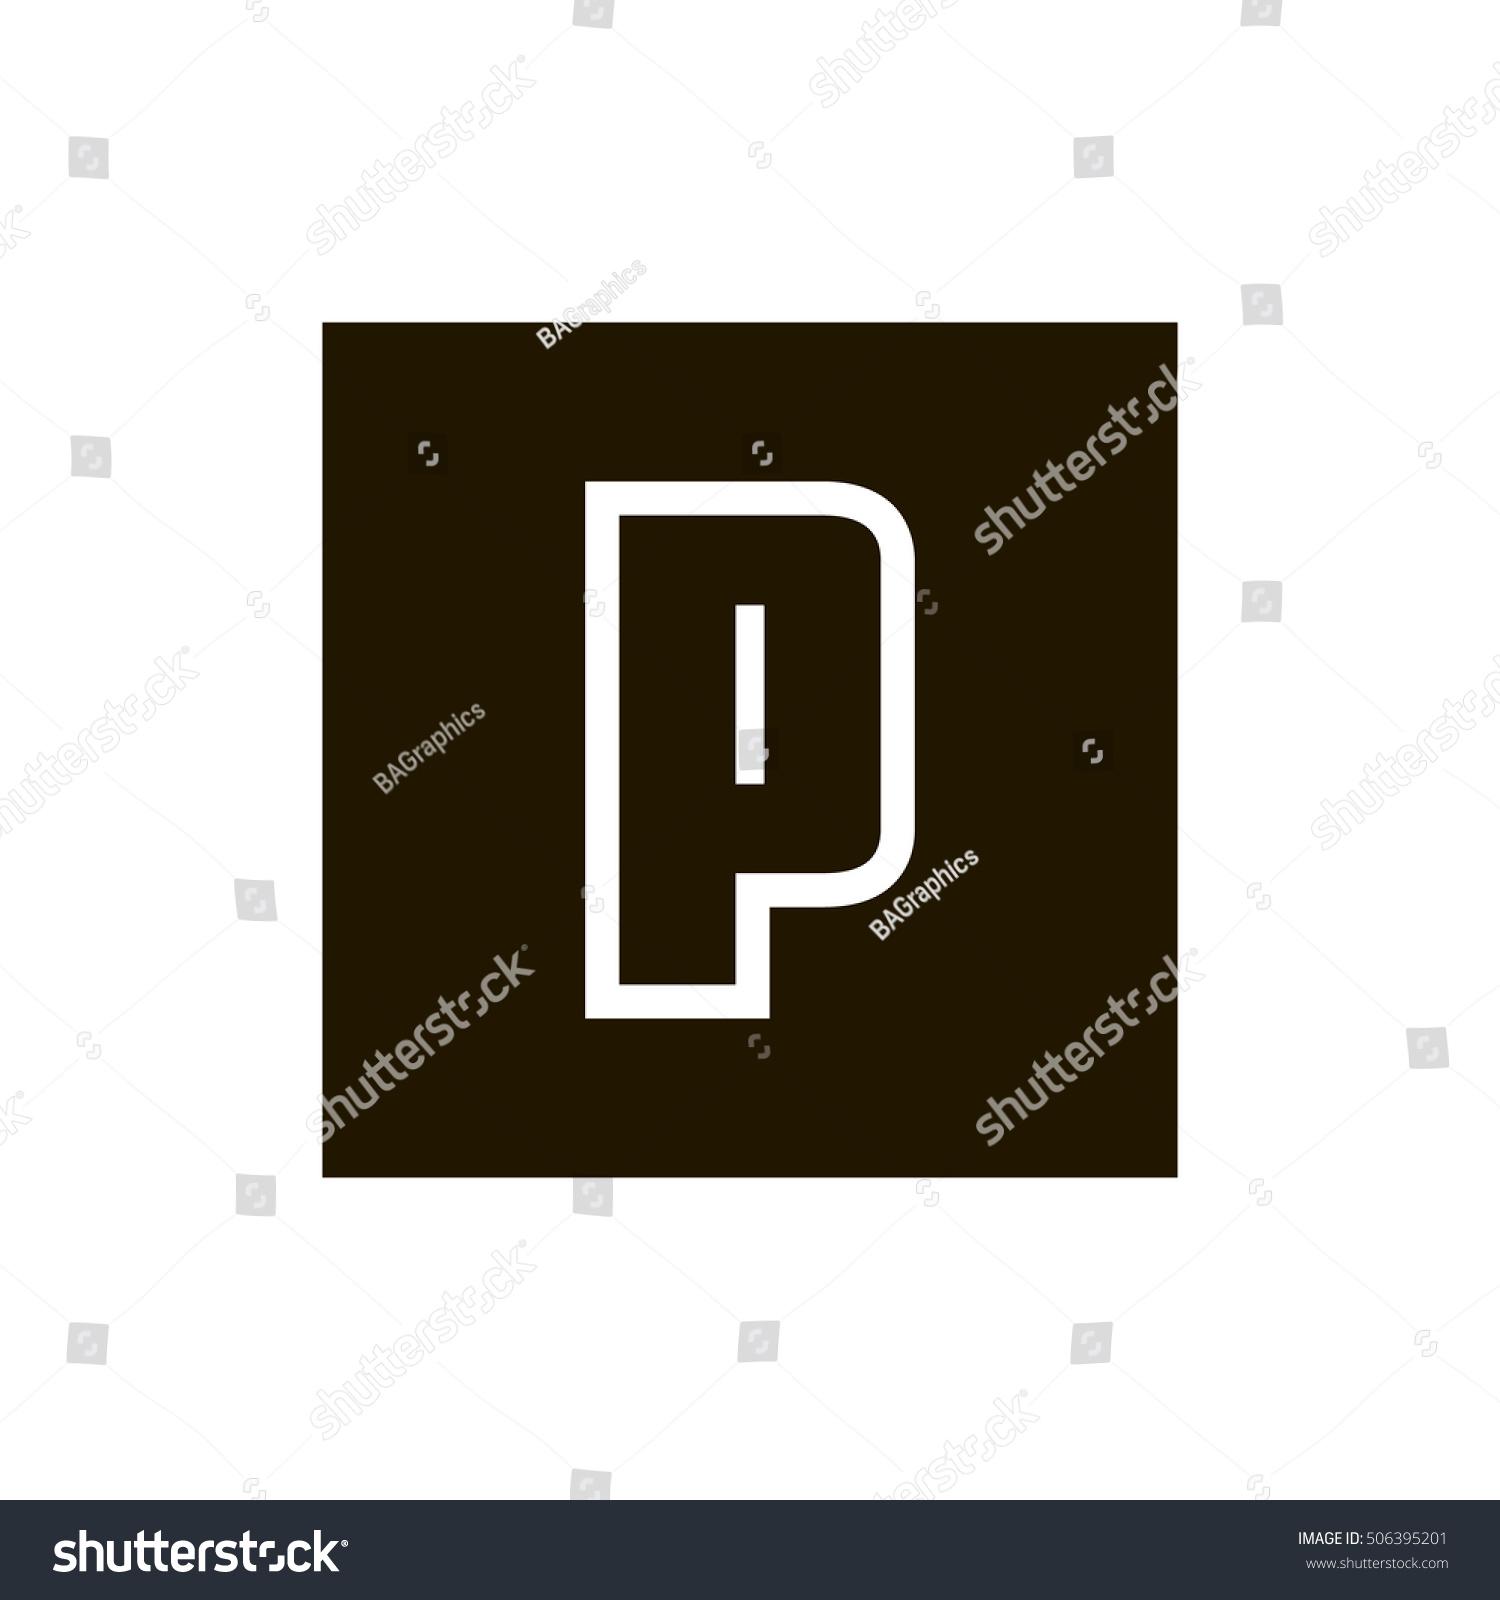 Letter p vector logo useful branding stock vector 506395201 letter p vector logo useful as branding symbol identity alphabet element biocorpaavc